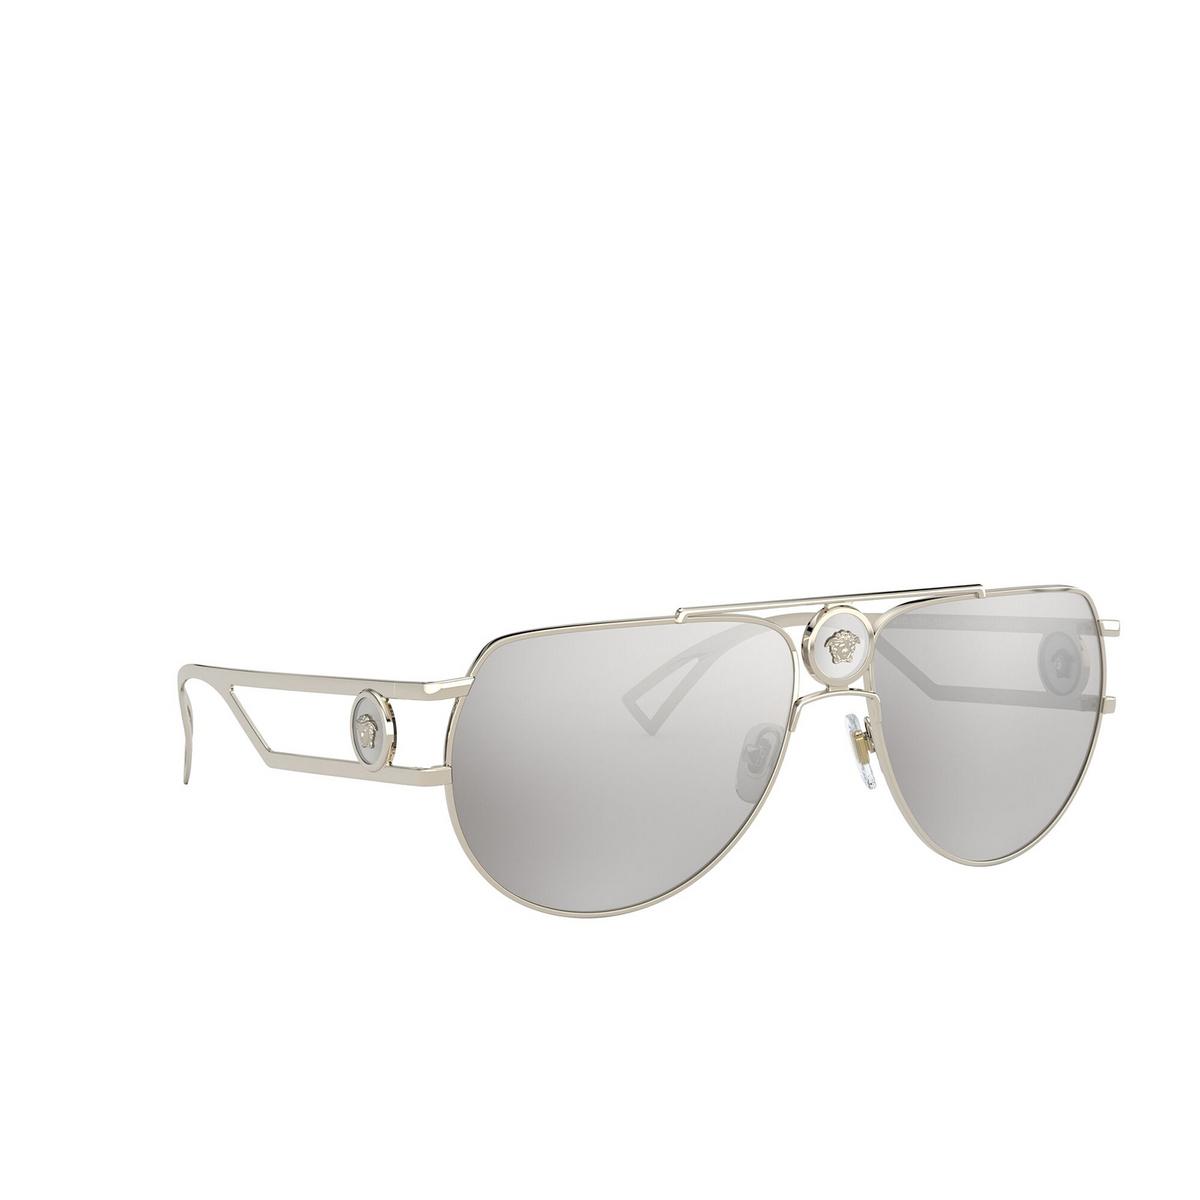 Versace® Aviator Sunglasses: VE2225 color Pale Gold 12526G - three-quarters view.